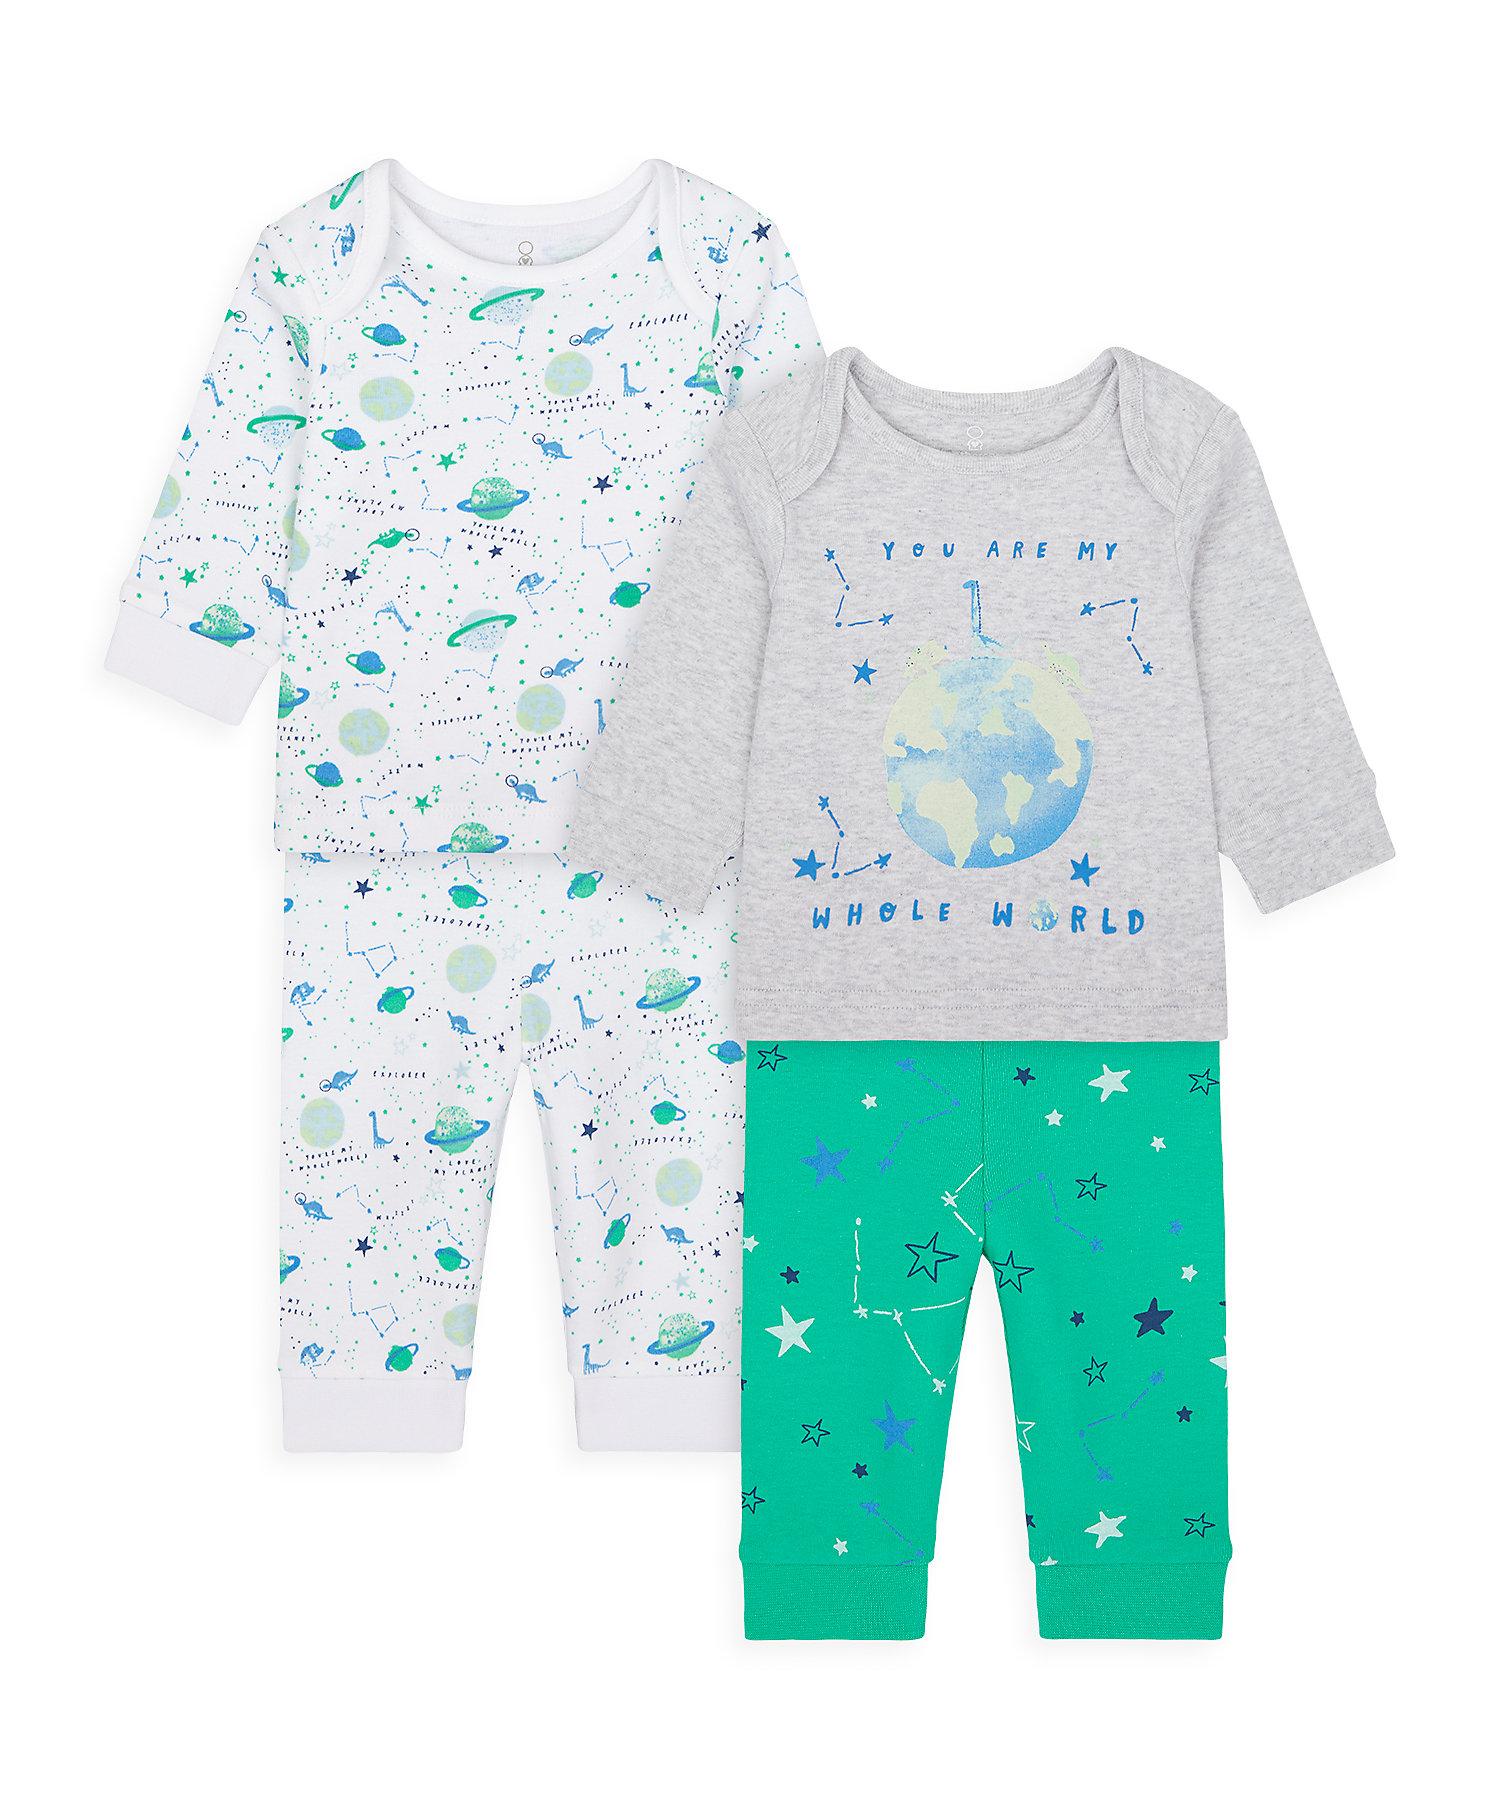 Mothercare | Boys Full Sleeves Pyjama Set Space Print - Pack Of 2 - Multicolor